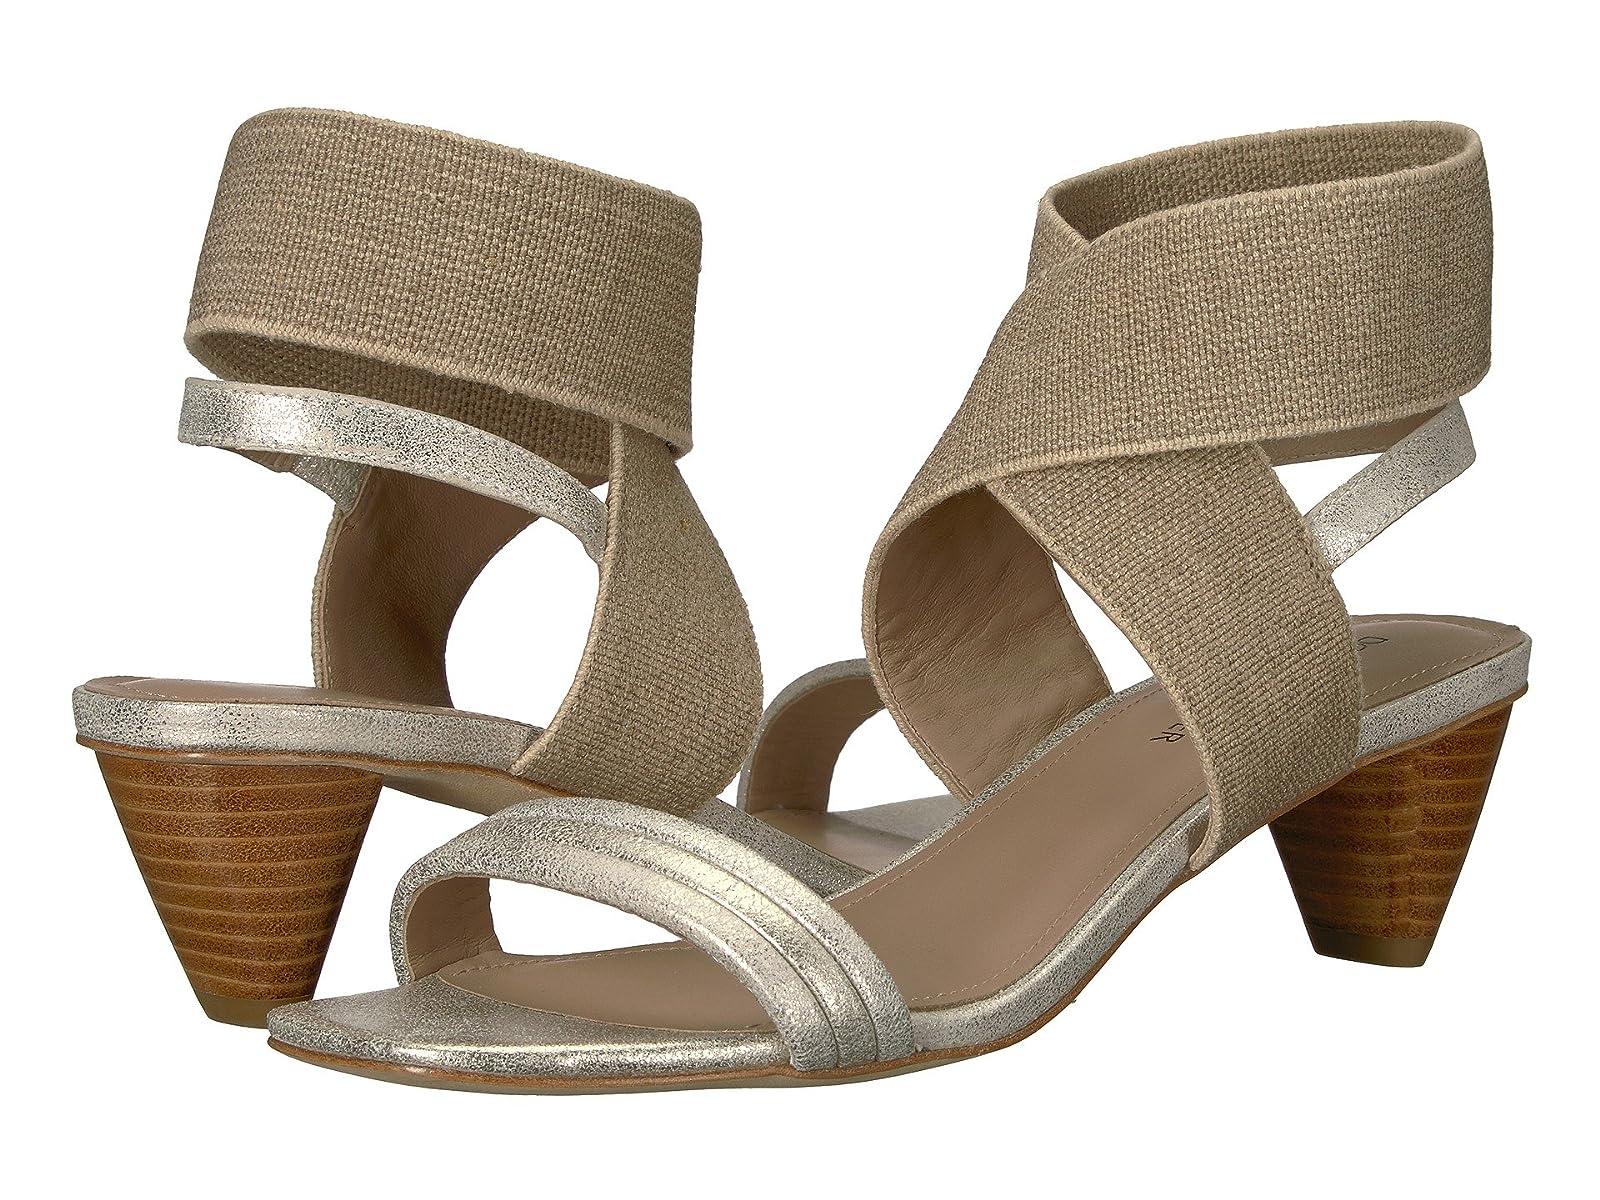 Donald J Pliner HiraCheap and distinctive eye-catching shoes